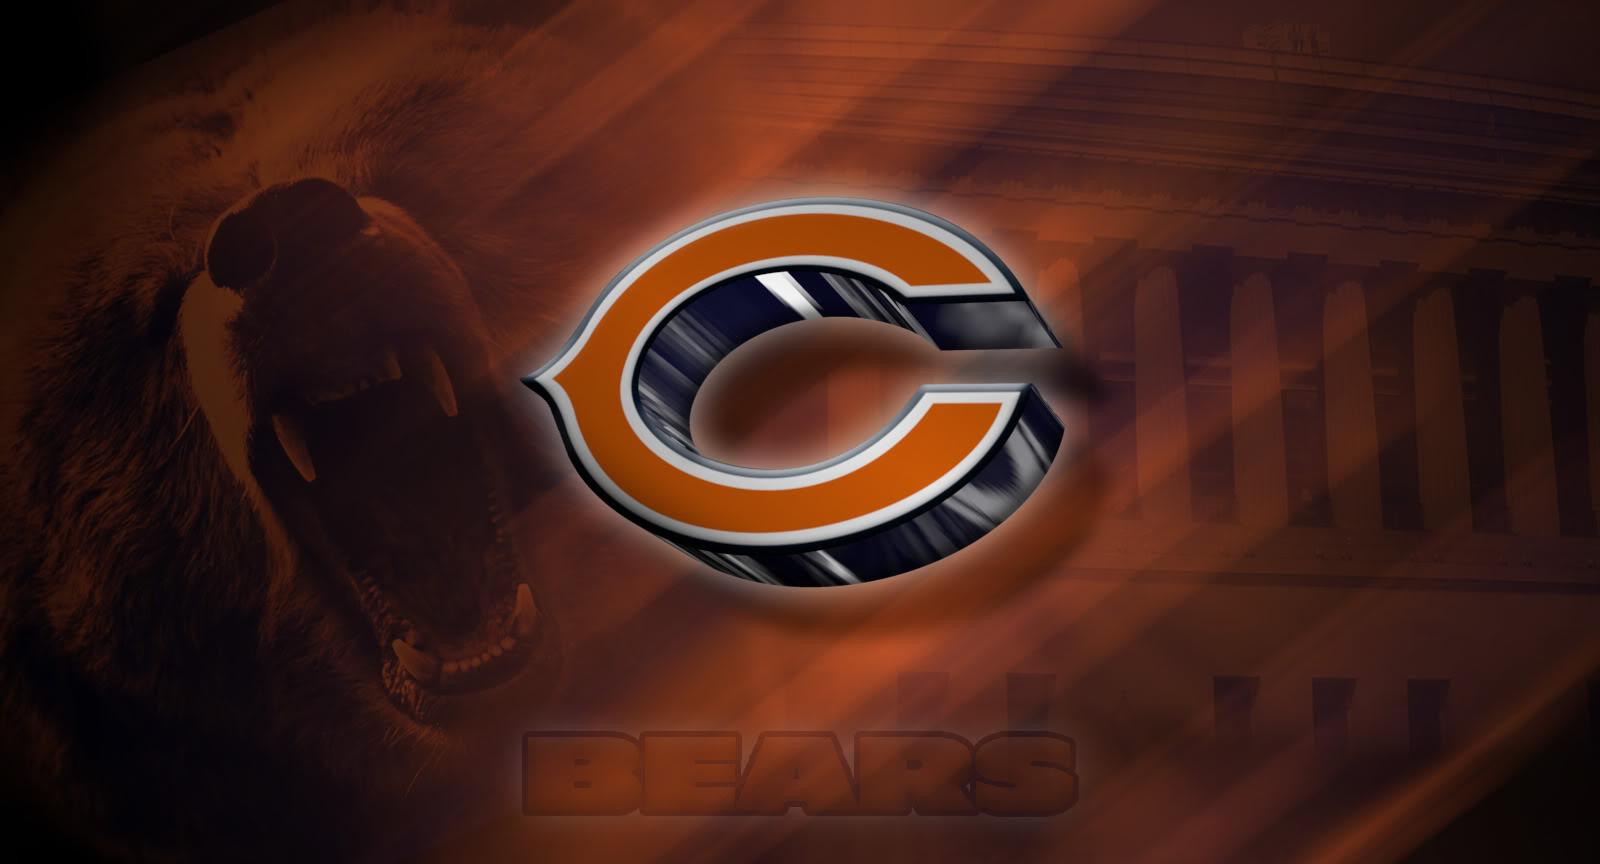 chicago bears soldier field desktop wallpaper download chicago bears 1600x864